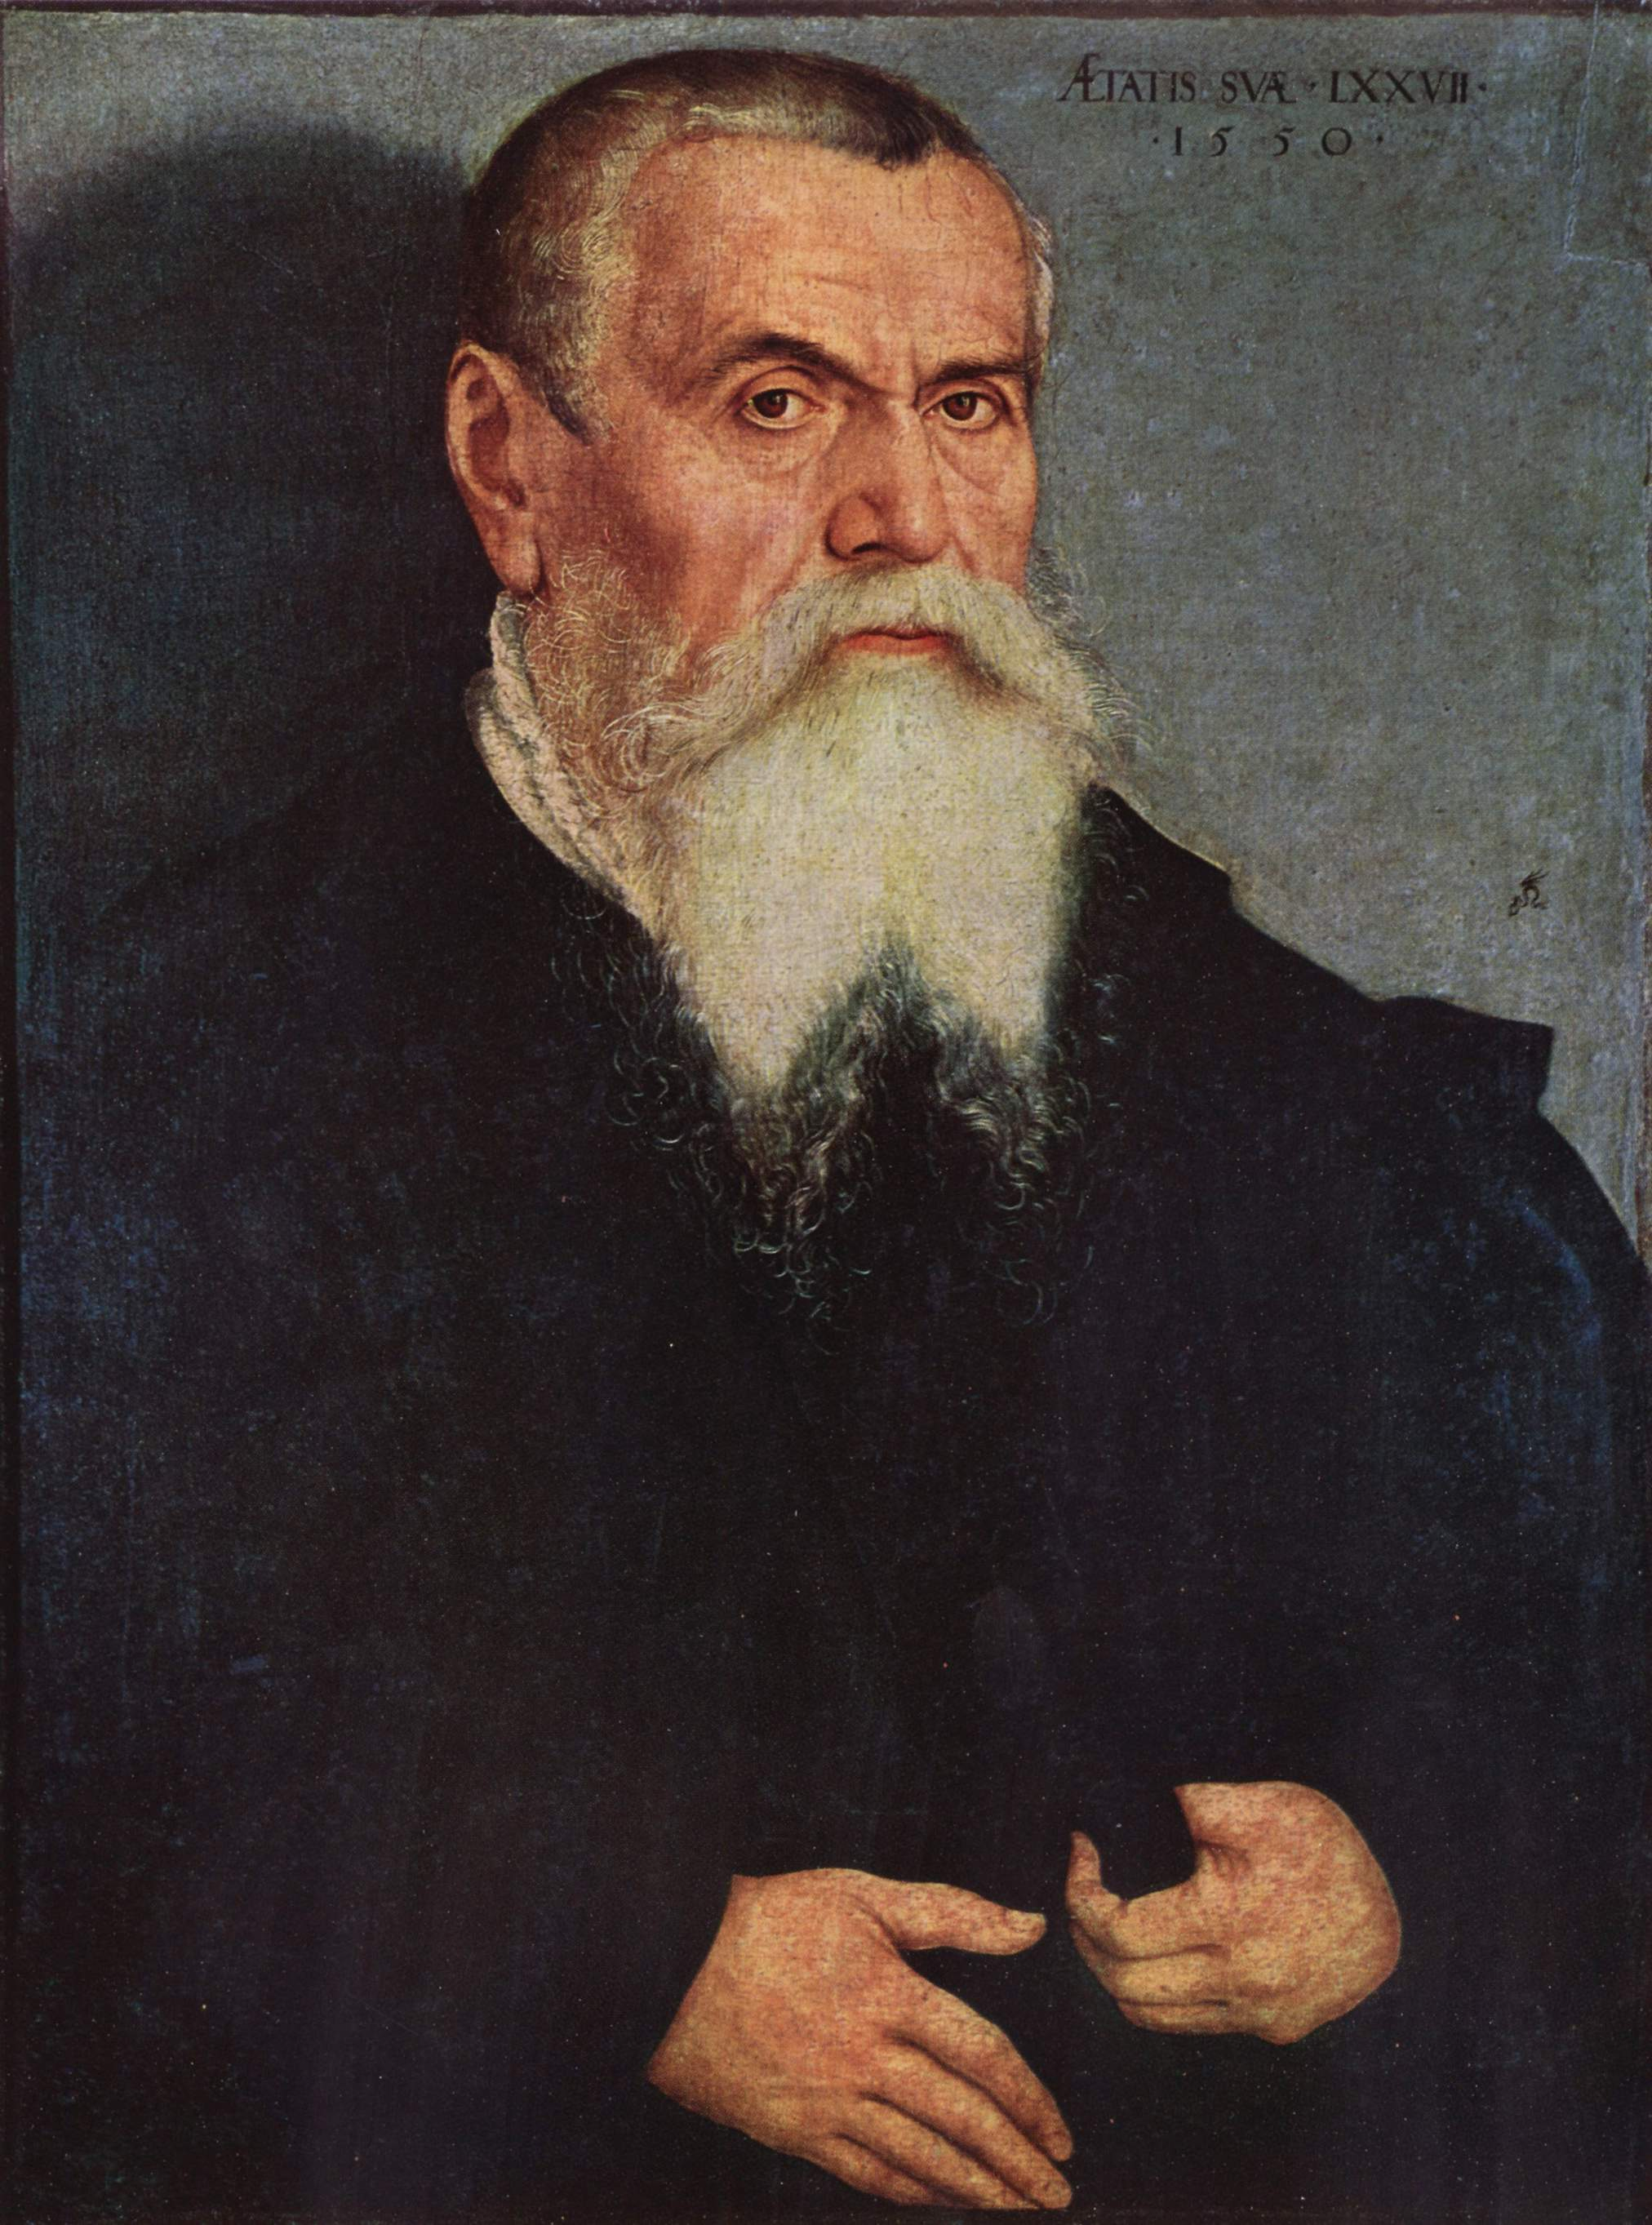 Cranach: Luther's Painter